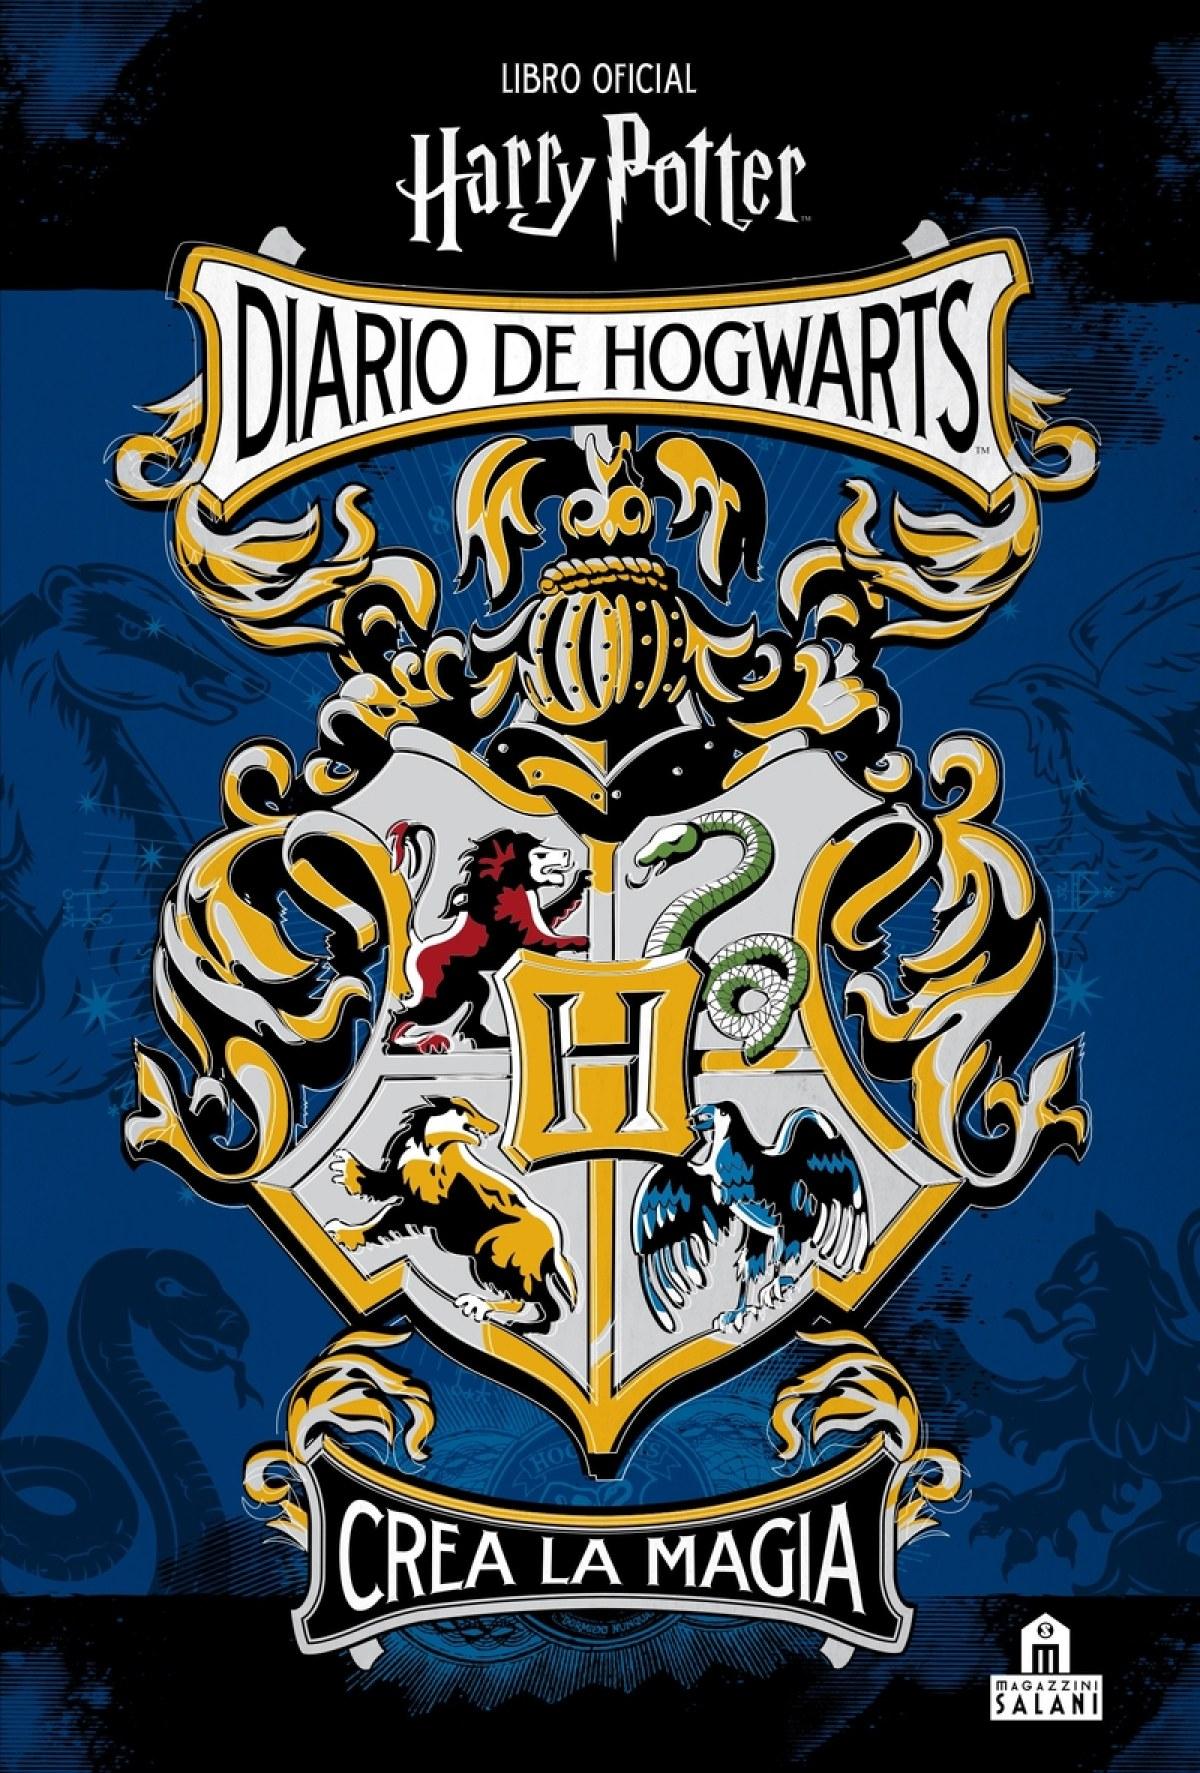 DIARIO DE HOGWARTS CREA LA MAGIA HARRY POTTER